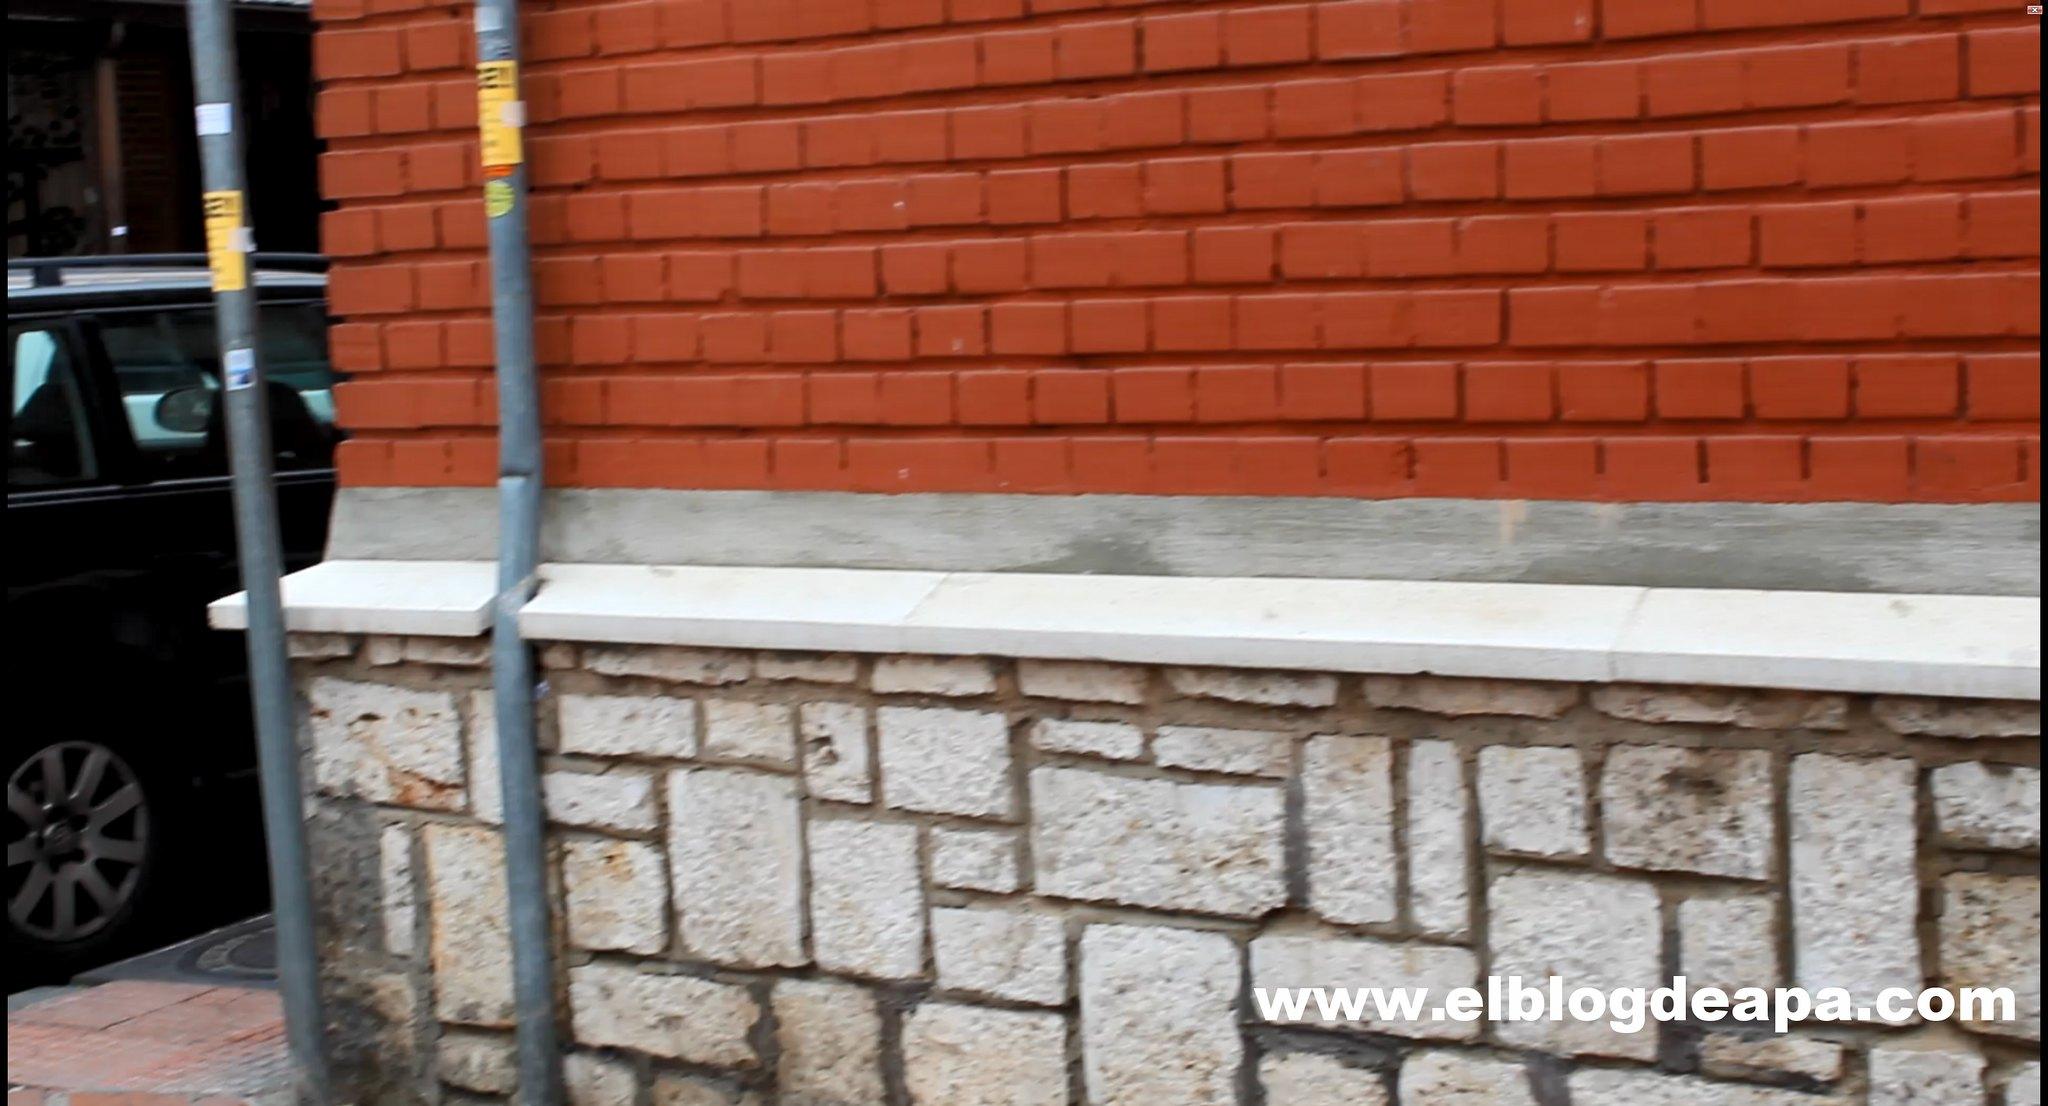 Reparación erosión fachada